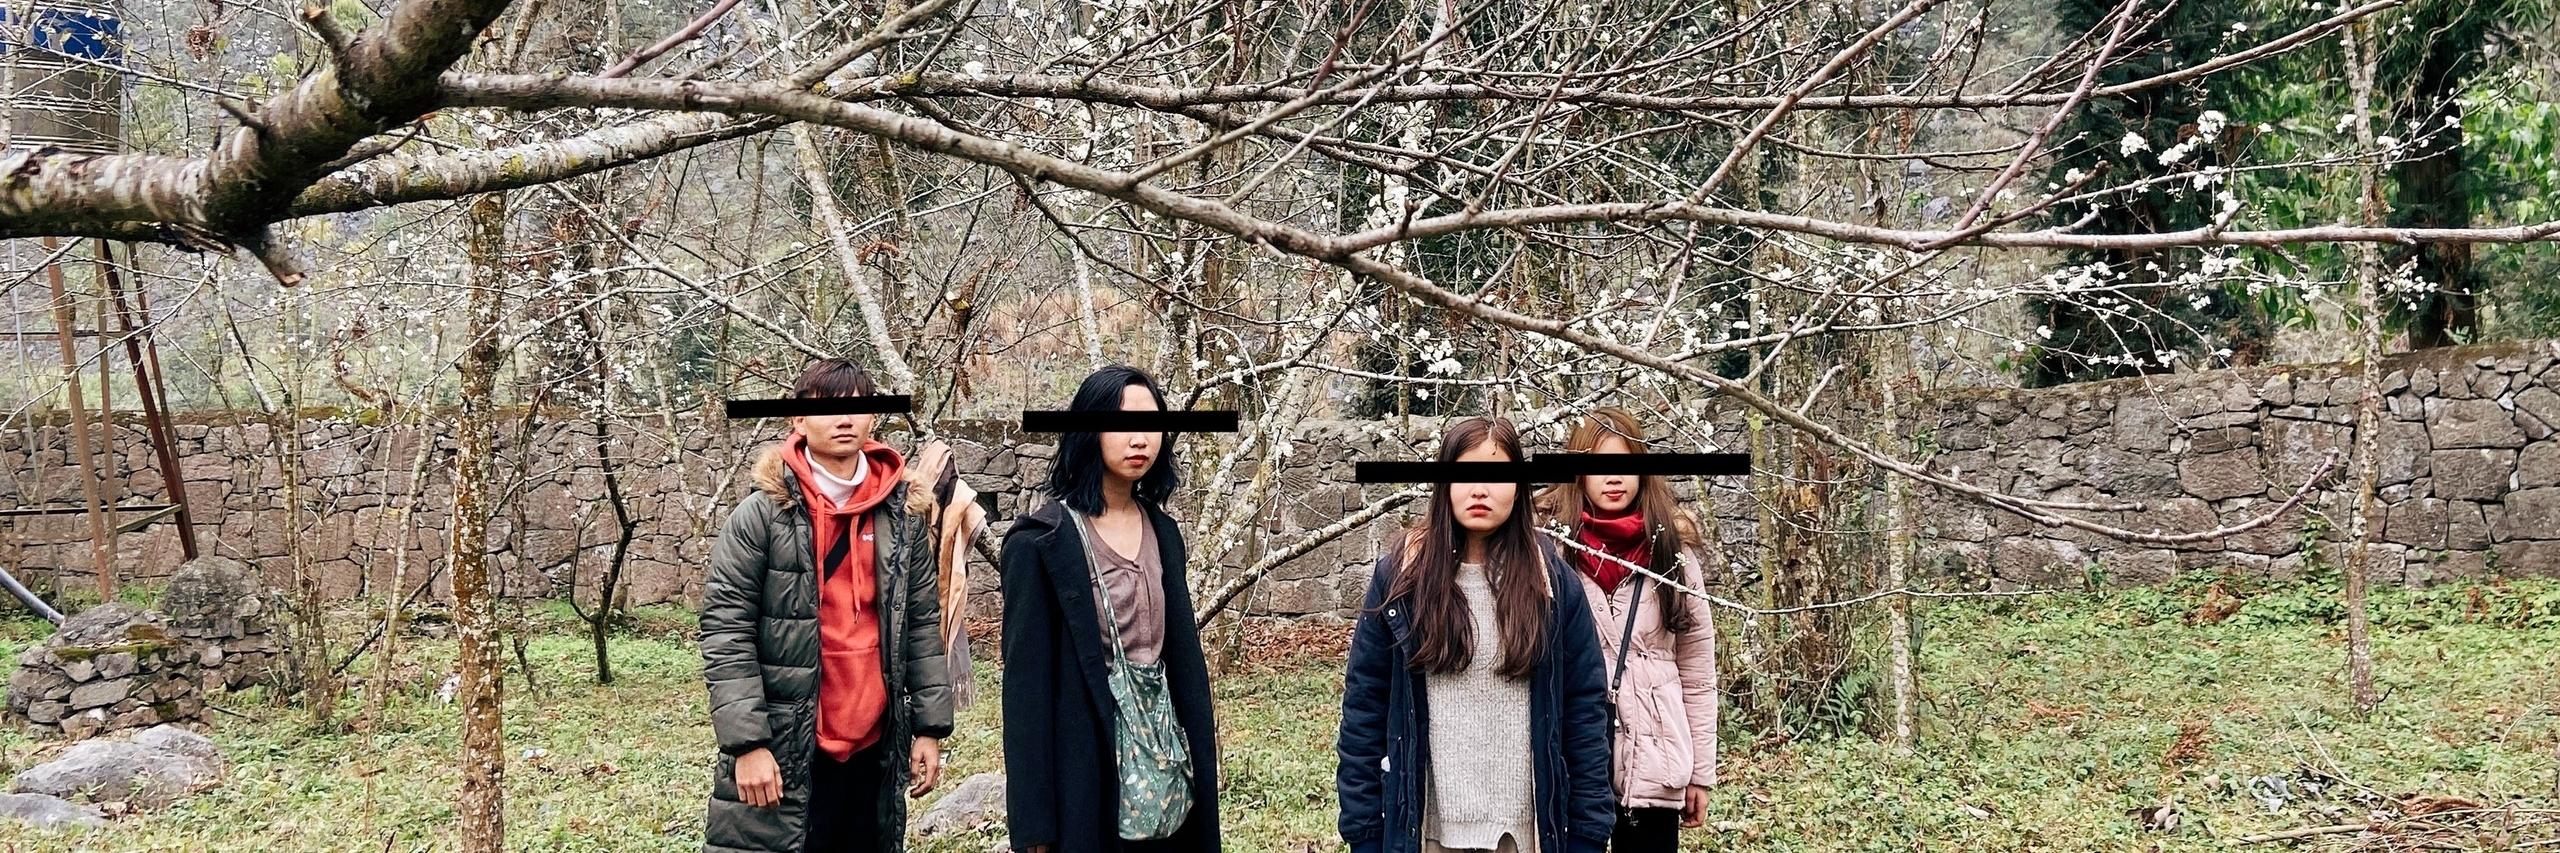 https://gody.vn/blog/guouhood6955/post/ha-giang-lan-3-cung-team-tu-nghiep-6324